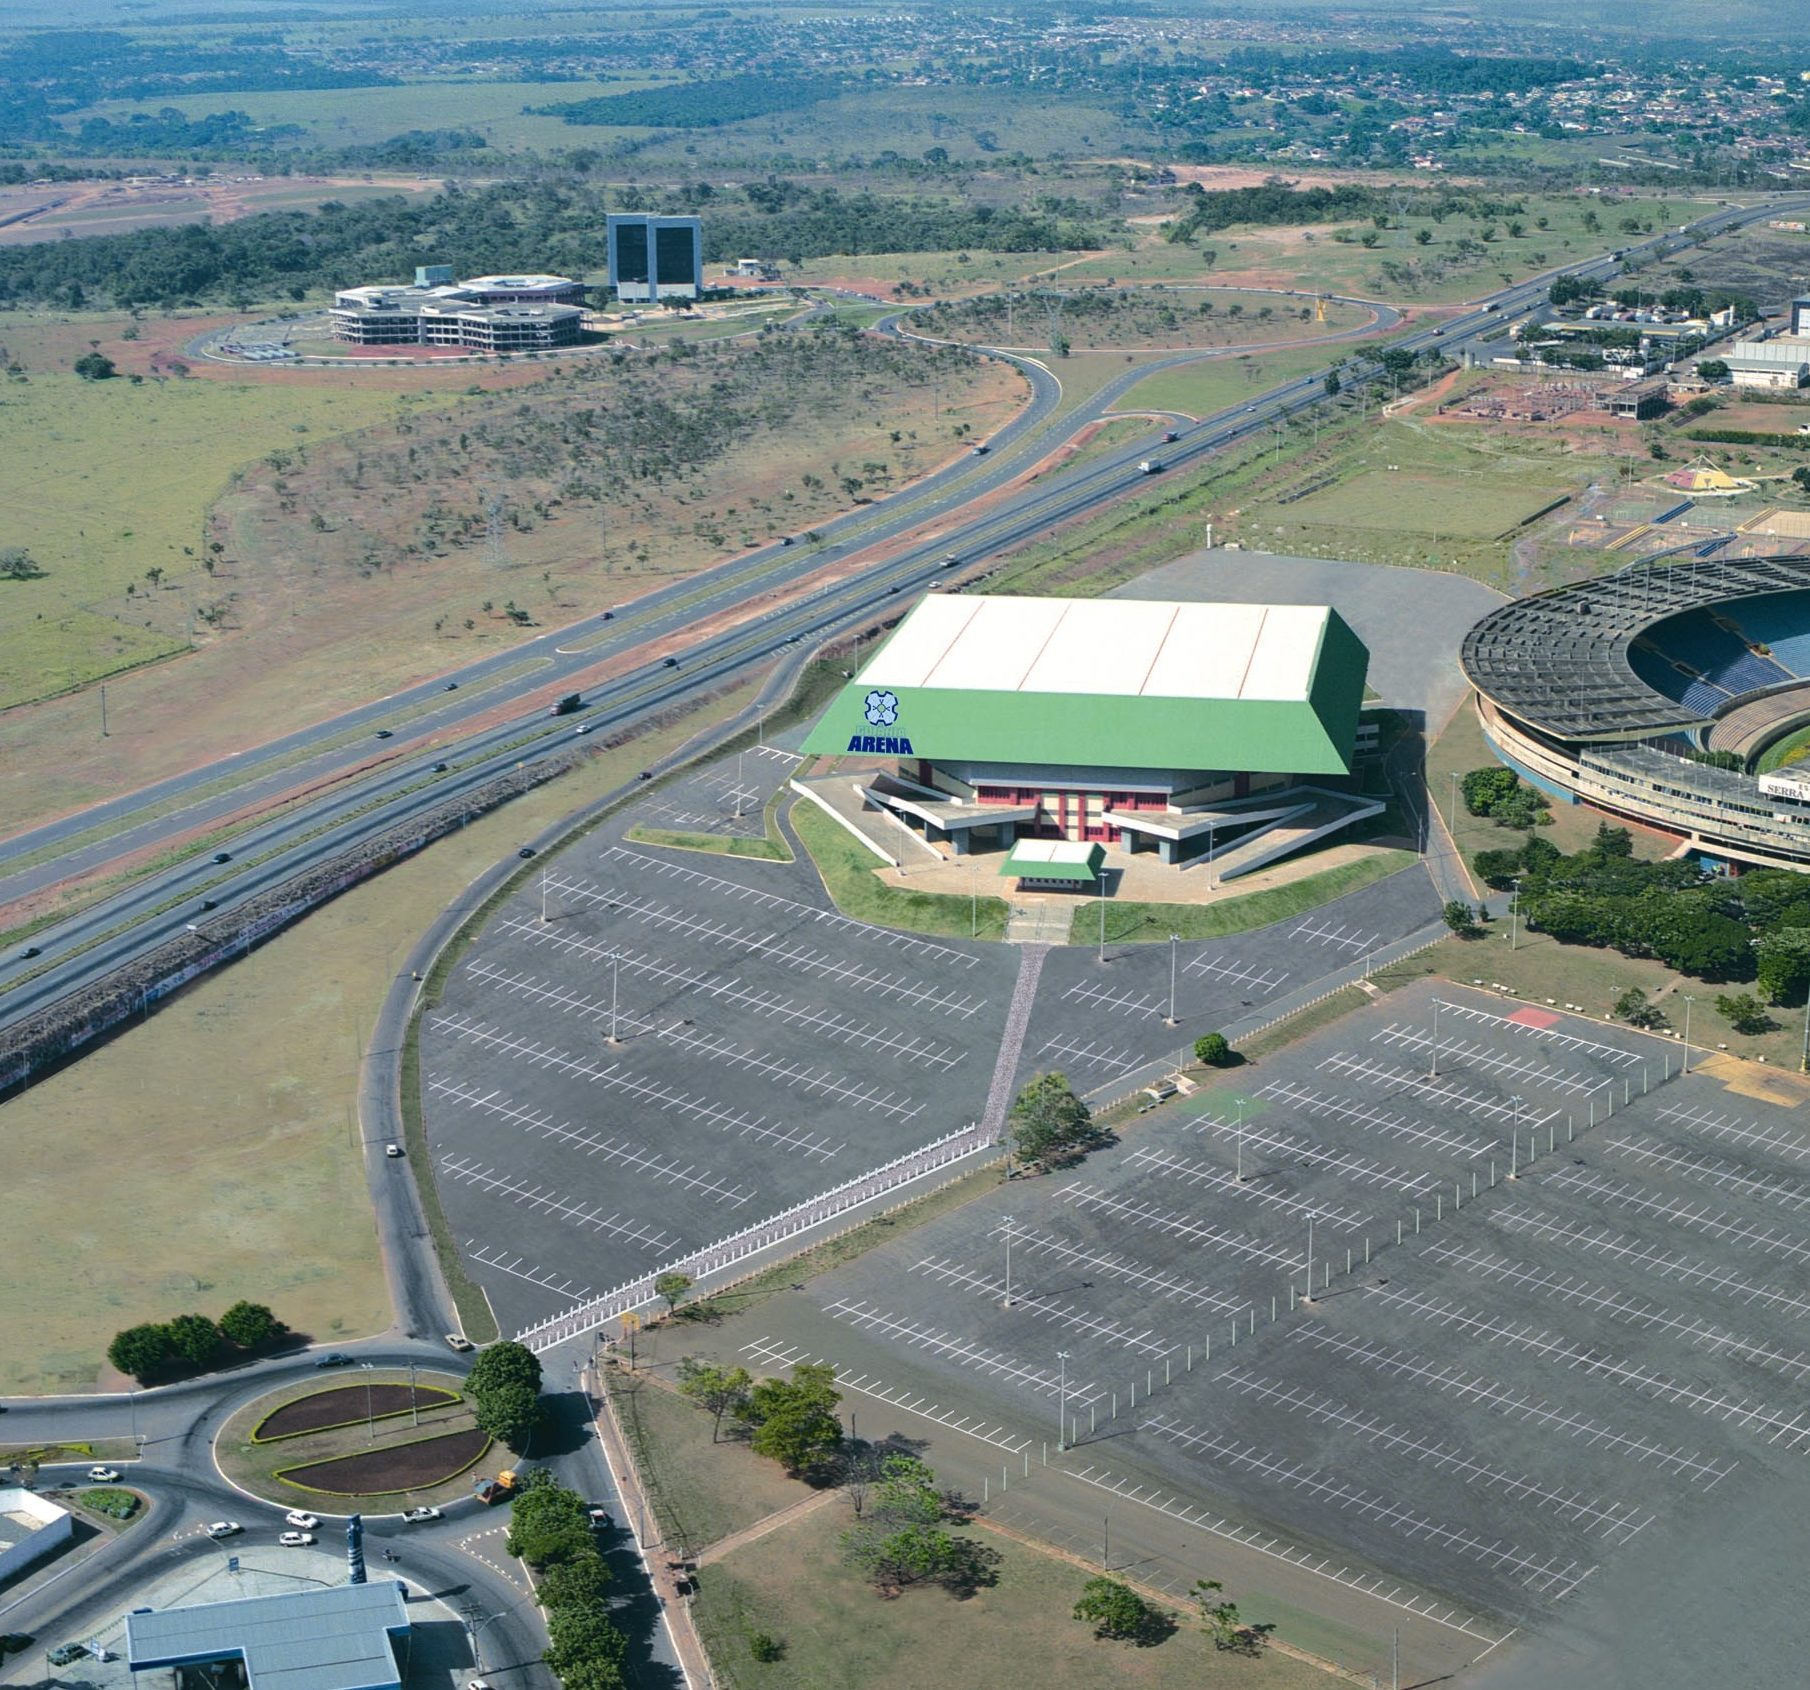 Goiânia Arena